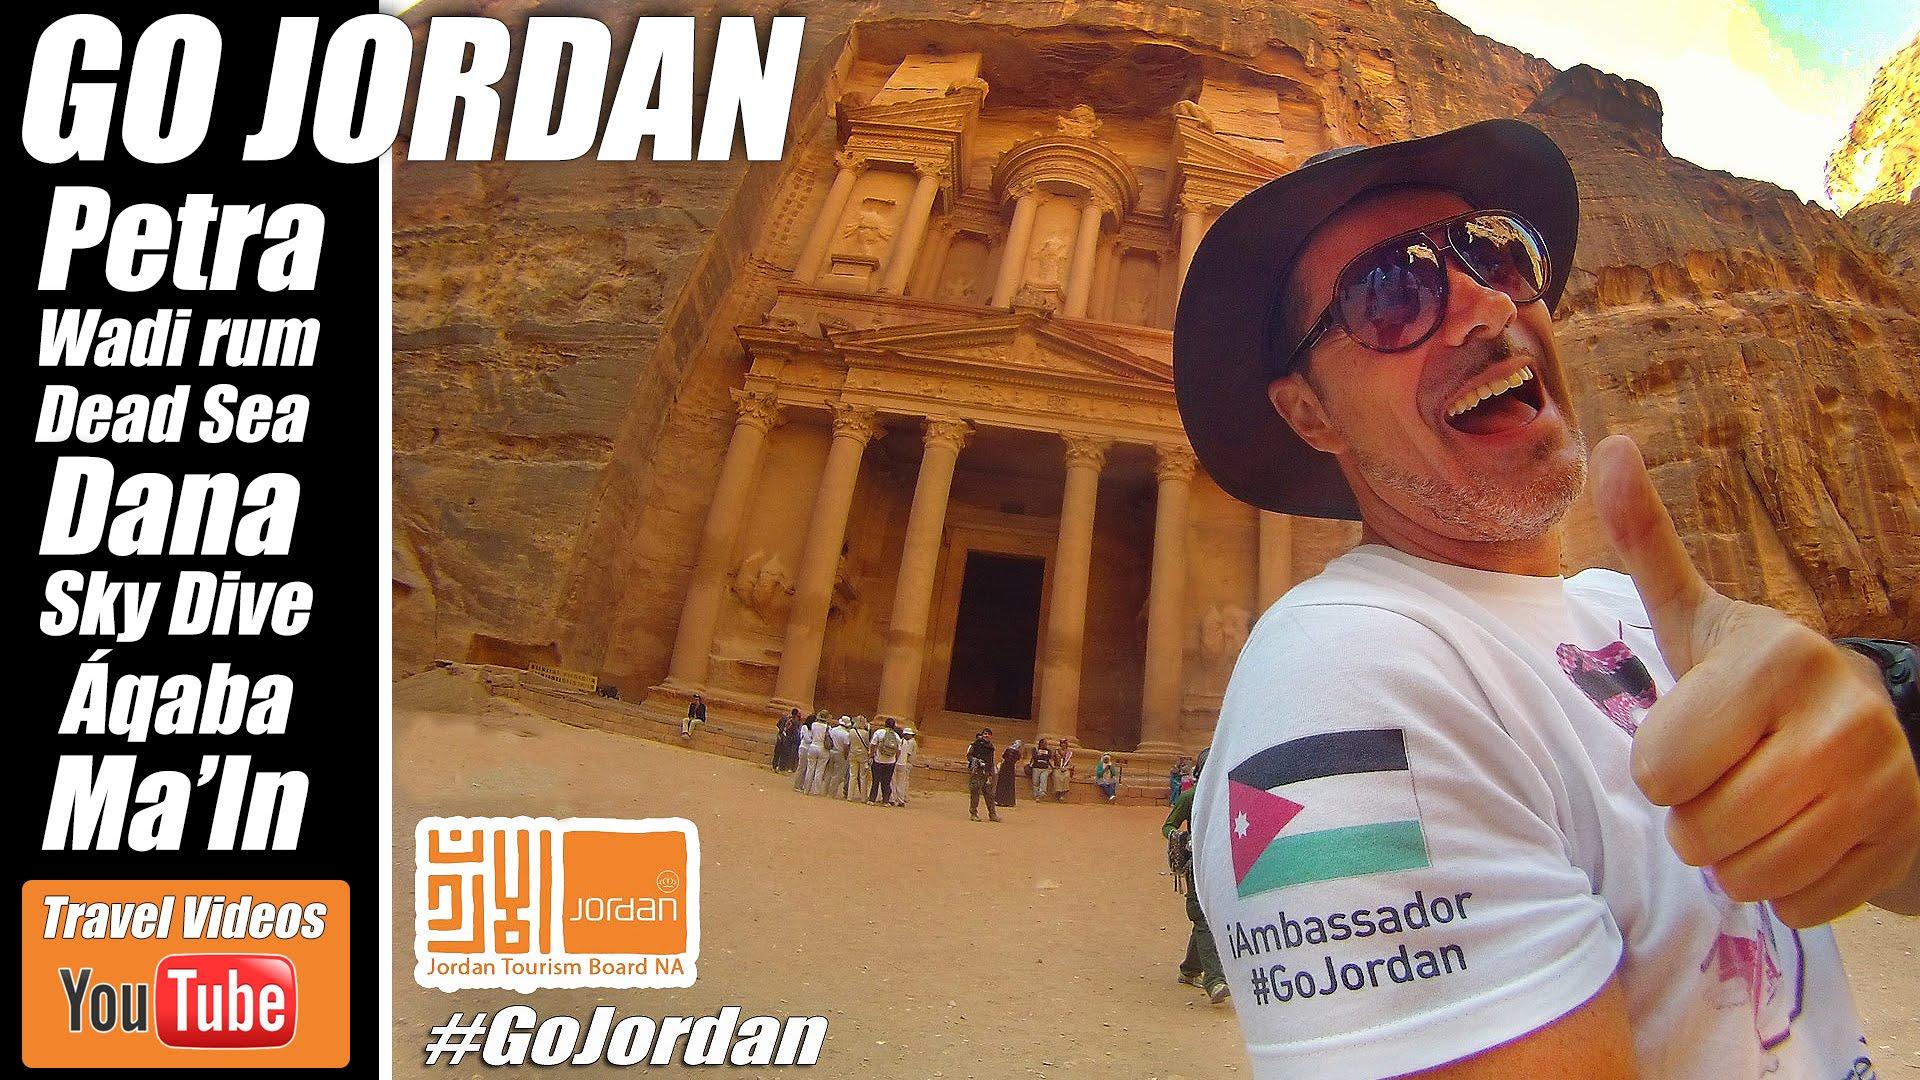 VIAJAR A AFRICA: PASAJES AEREOS A JORDANIA 2